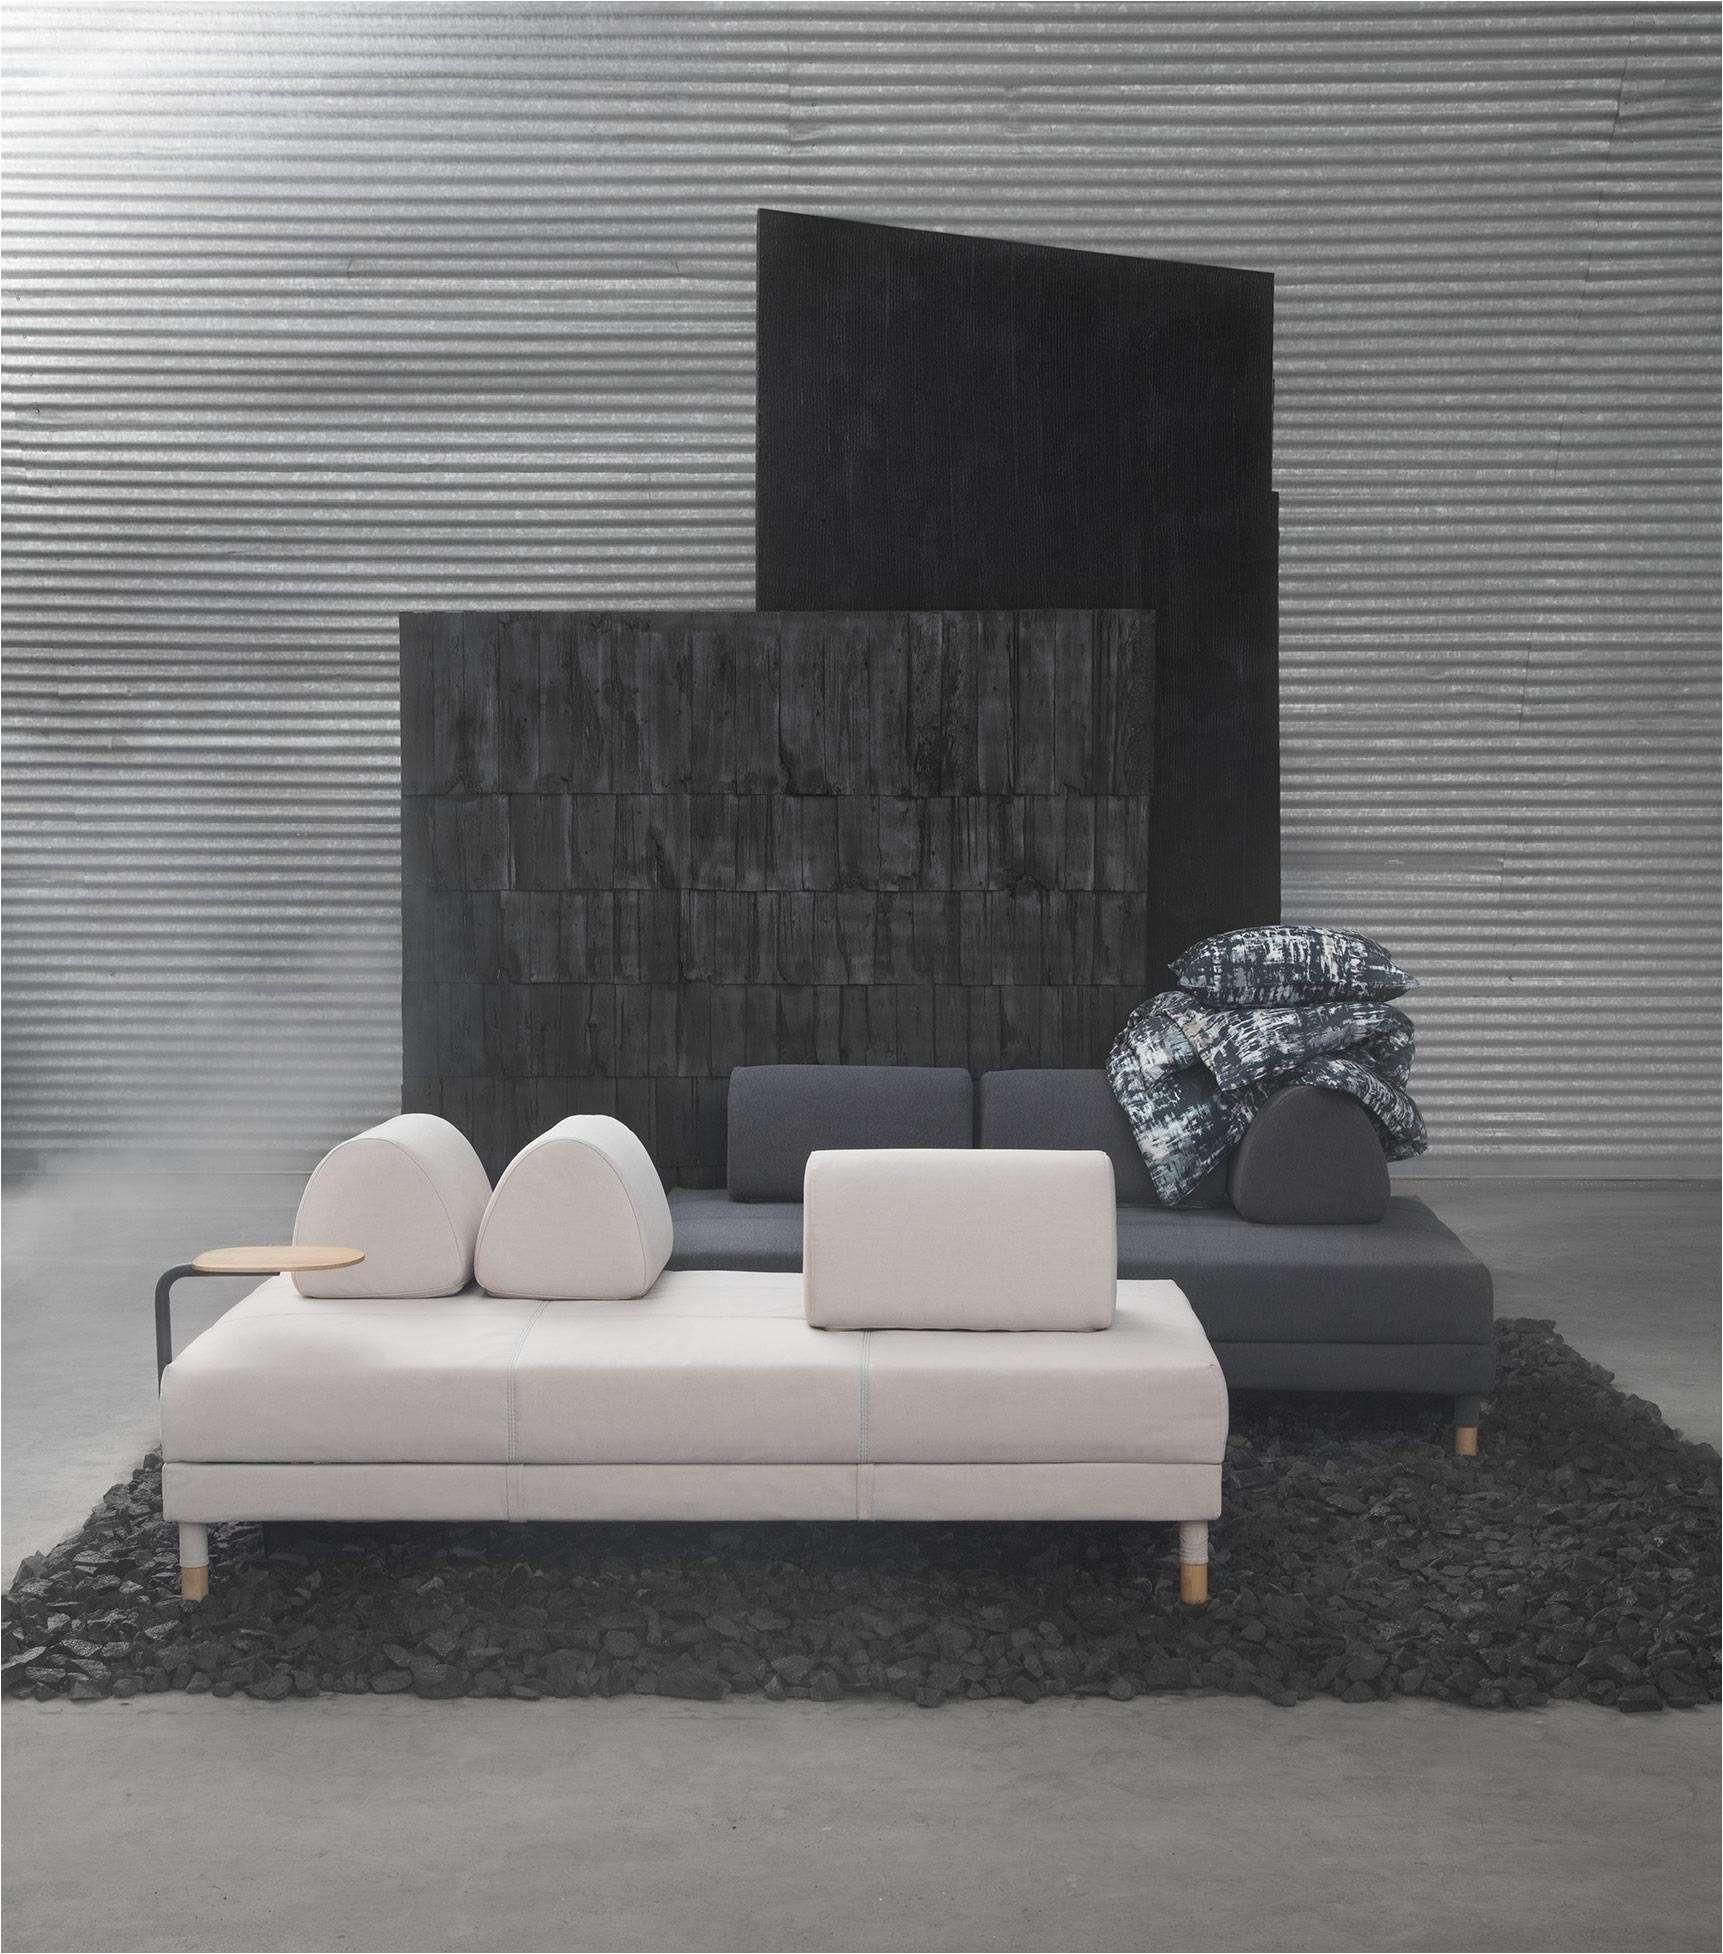 Ikea Small Home Plans Inspirational Ikea Bathroom 0d Scheme Design Design Ideas Furniture and Living